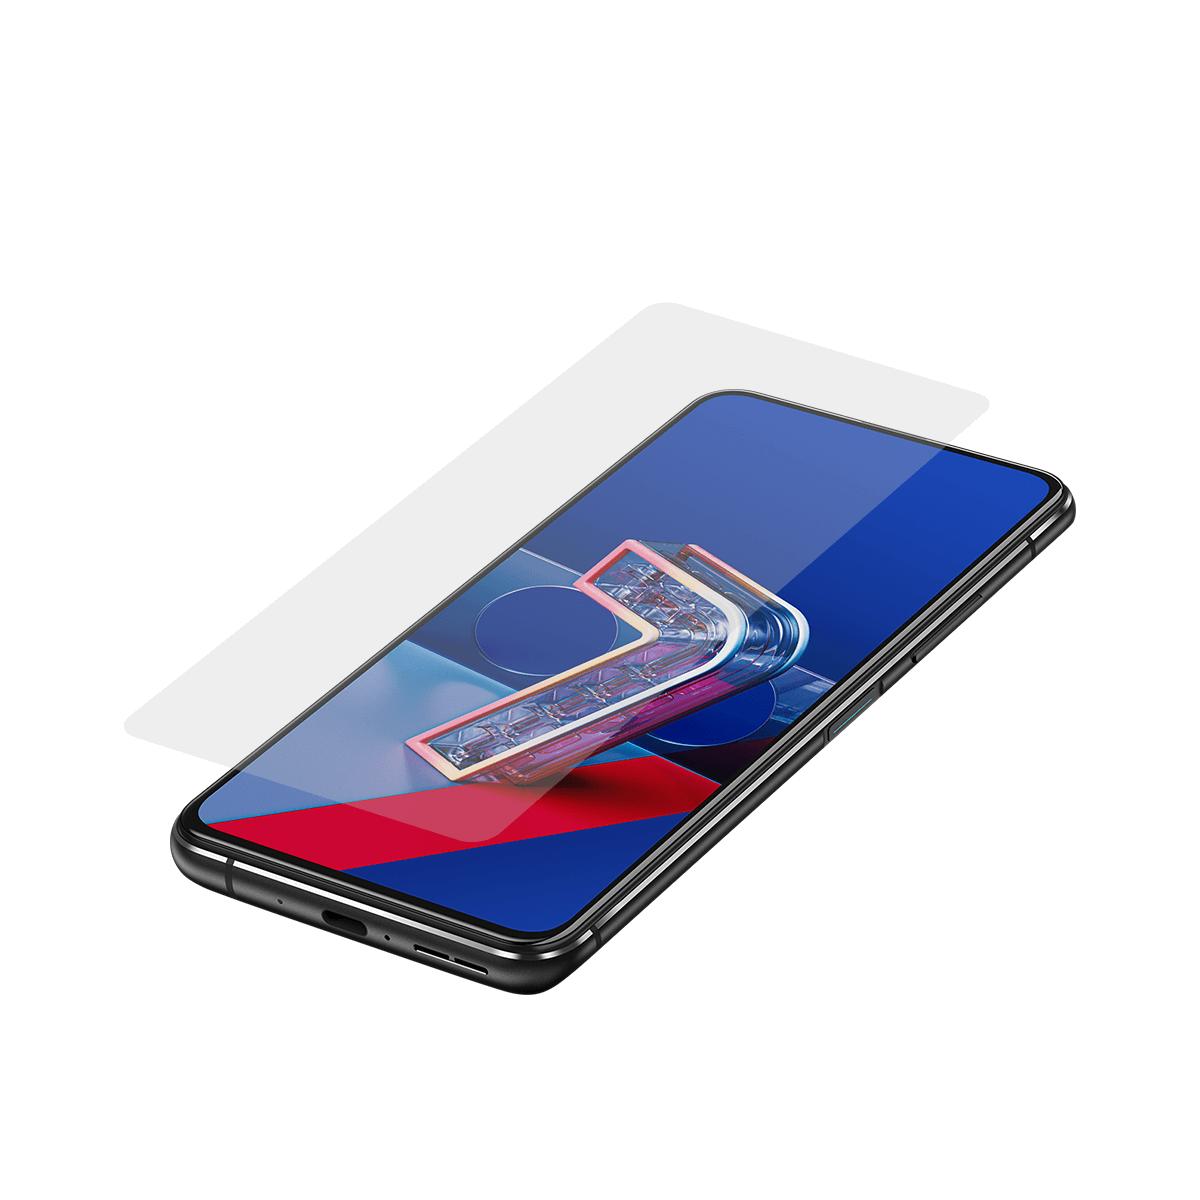 Zenfone 8 Flip / 7 玻璃纖維屏幕保護貼